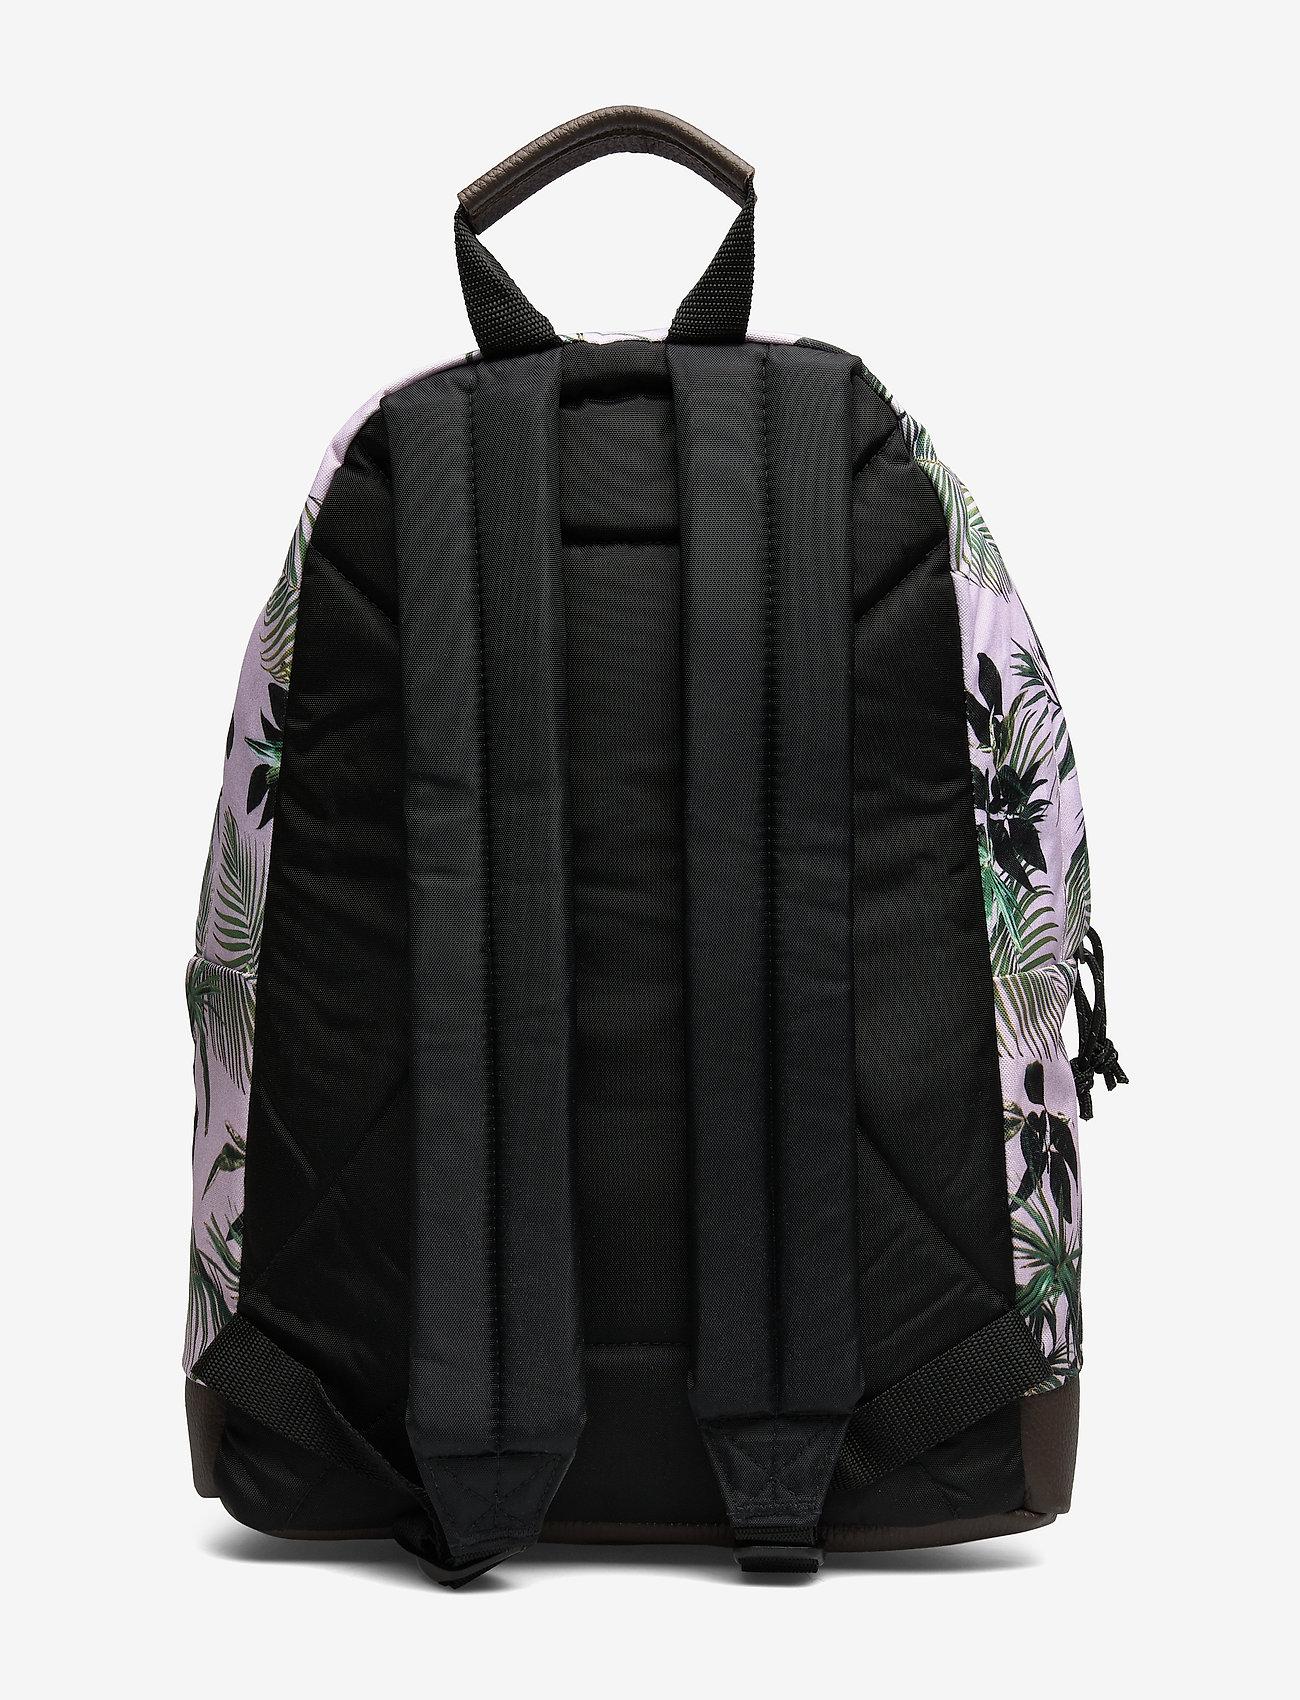 Eastpak - WYOMING - ryggsäckar - brize mel pink - 1